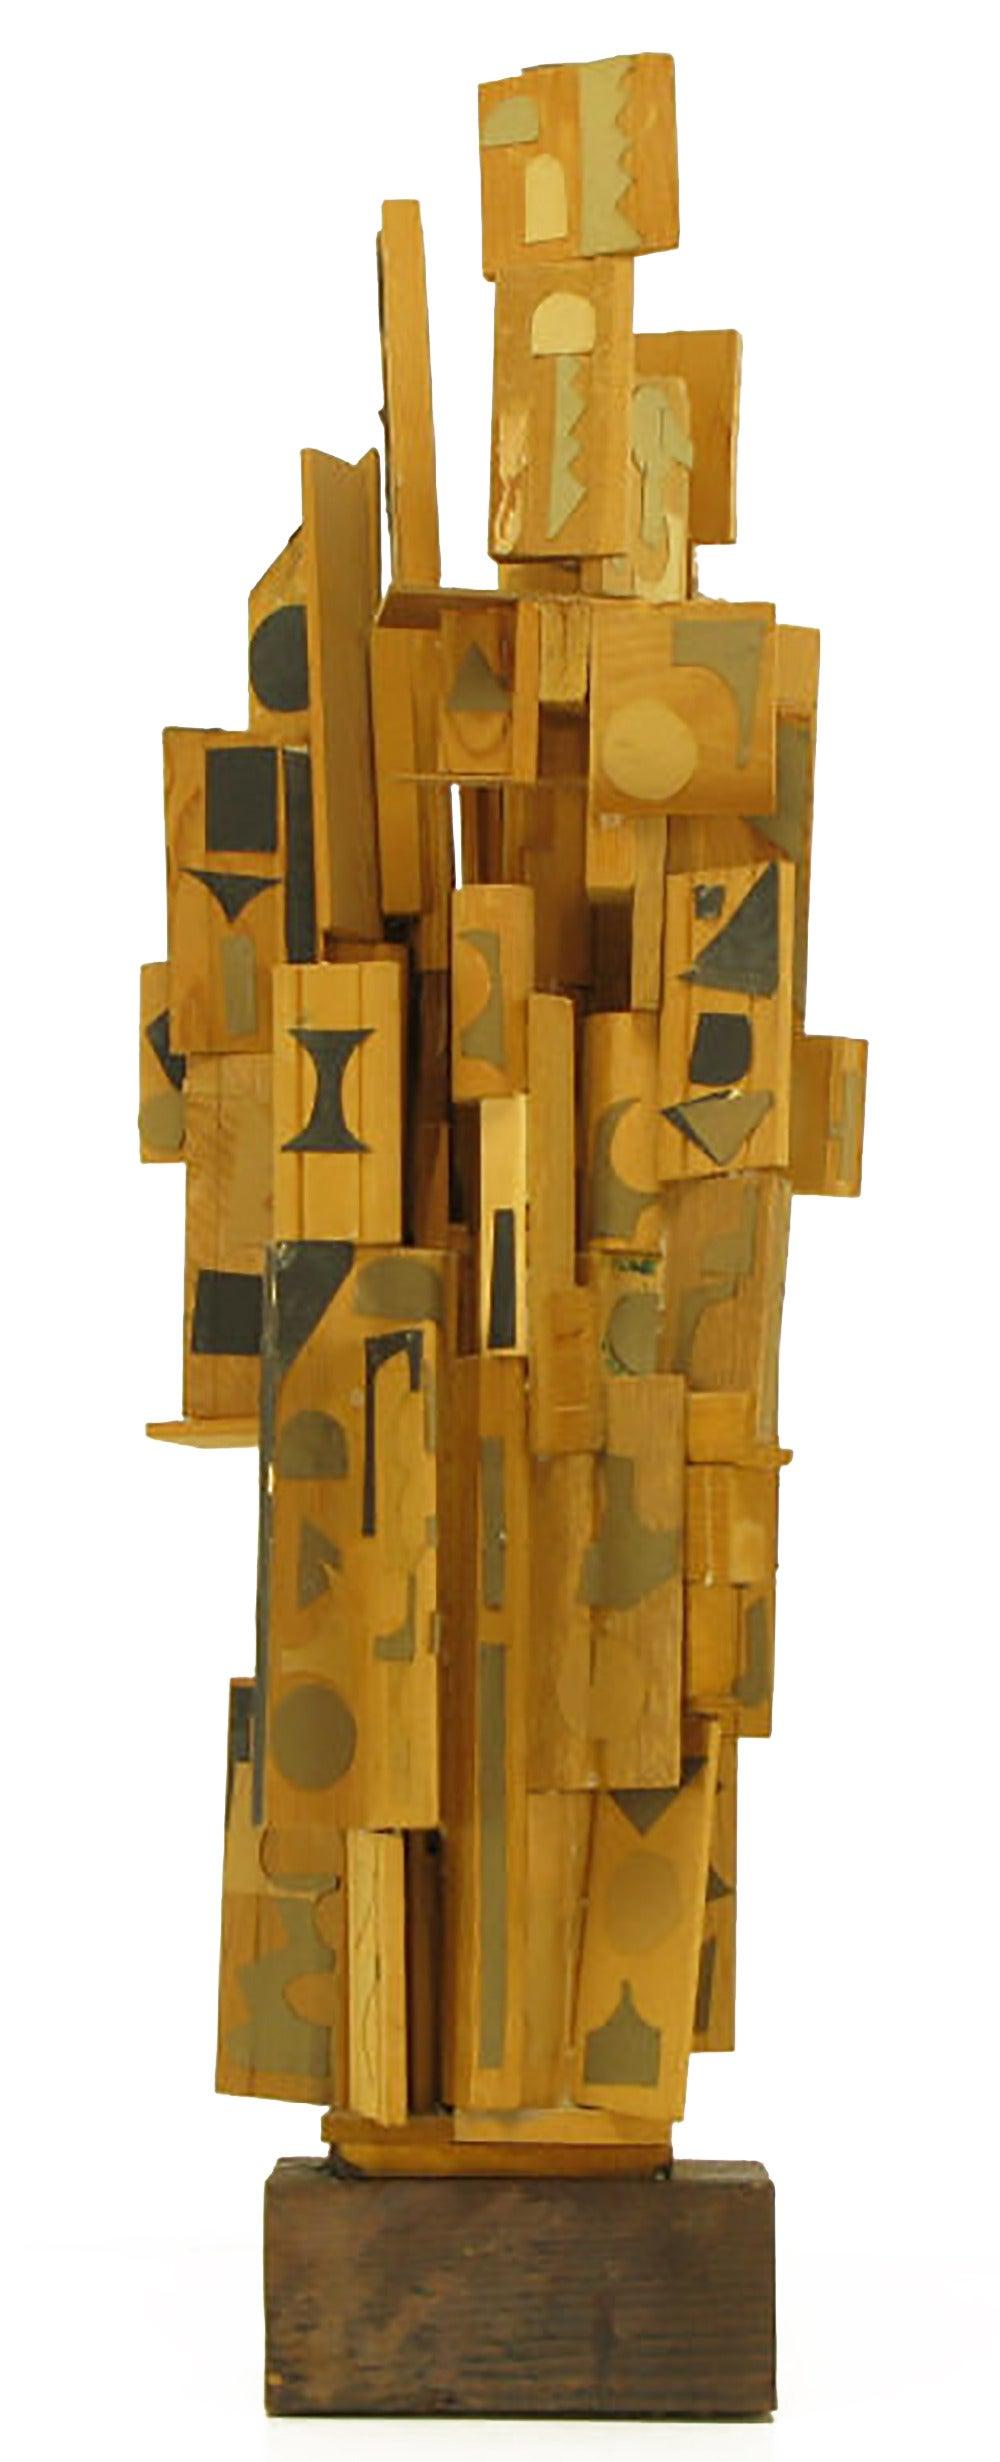 Mexican paper mache vintage judas sculpture folk art at 1stdibs - Outsider Art Wood Sculpture With Geometric Appliques 2